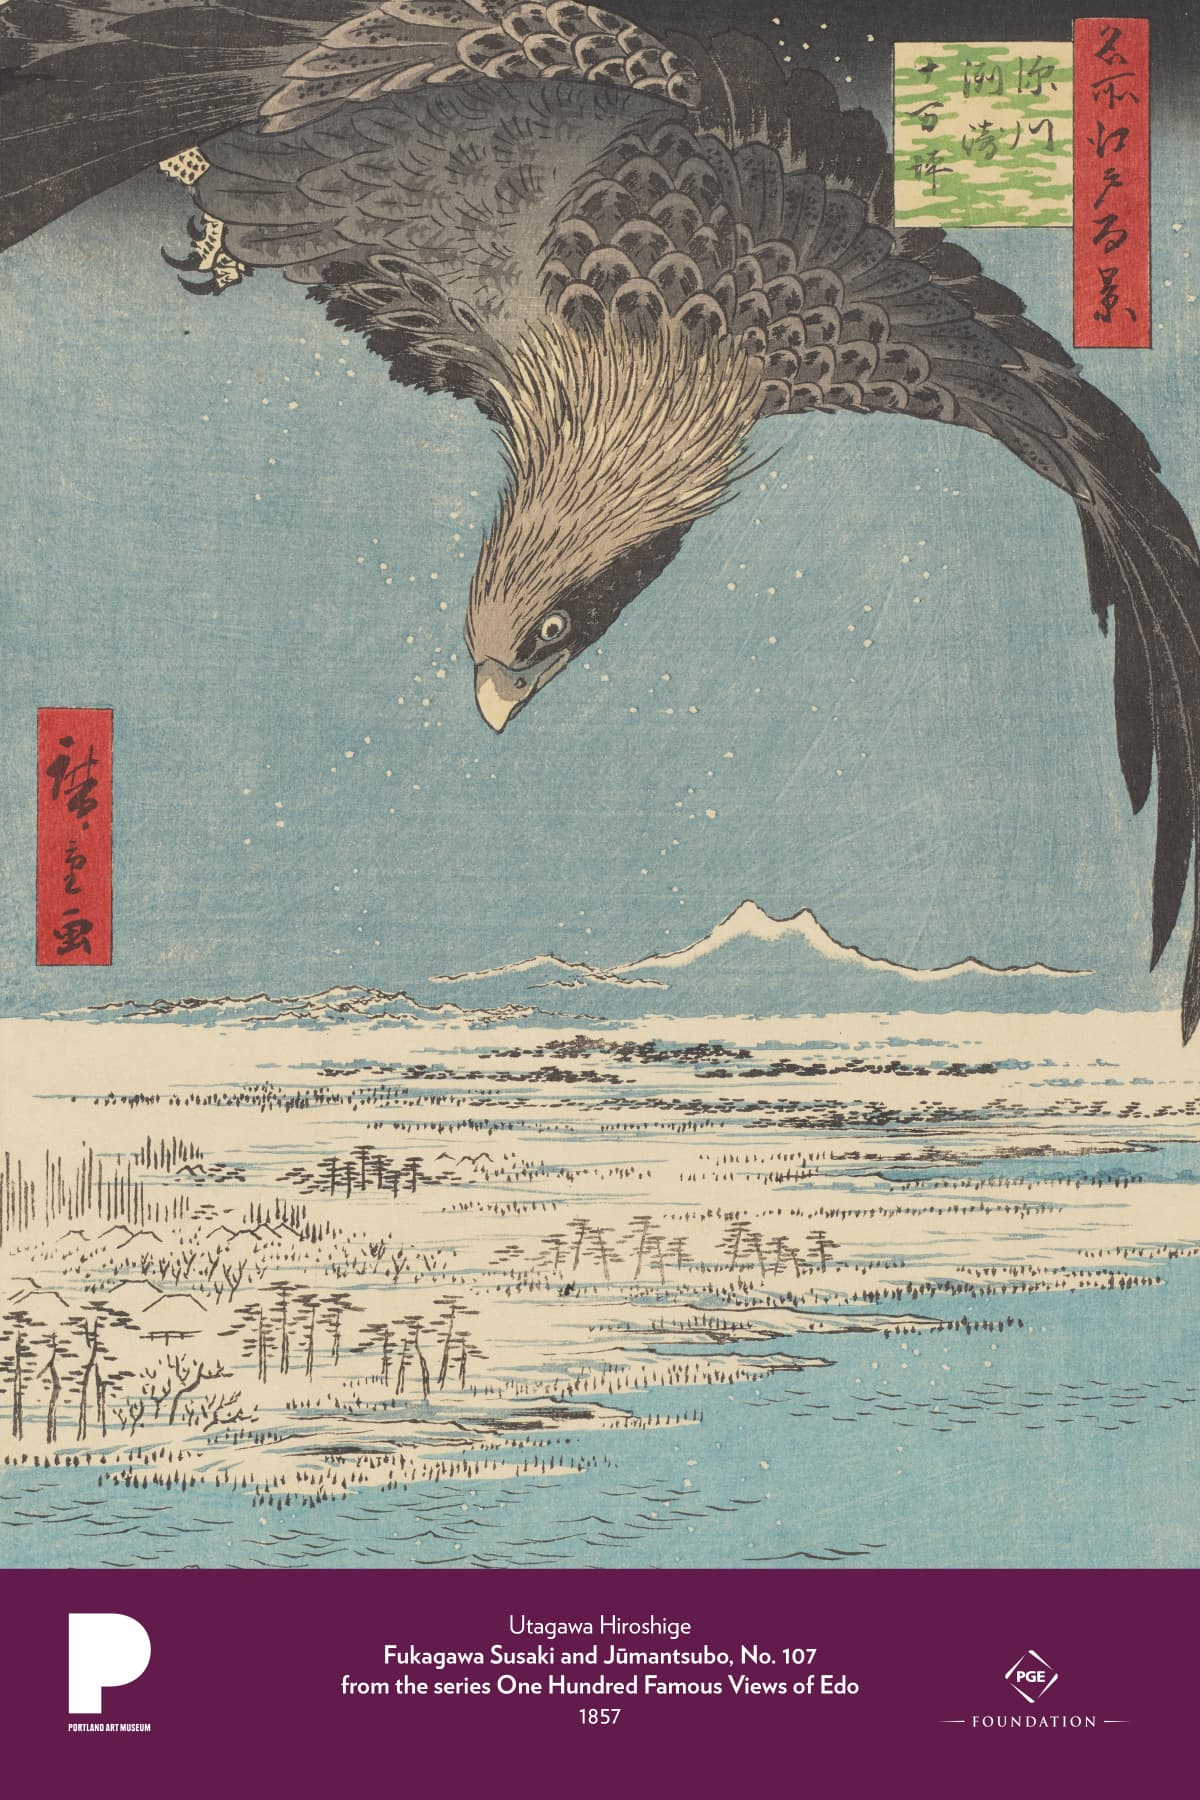 Fukagawa Susaki and Jūmantsubo, No. 107